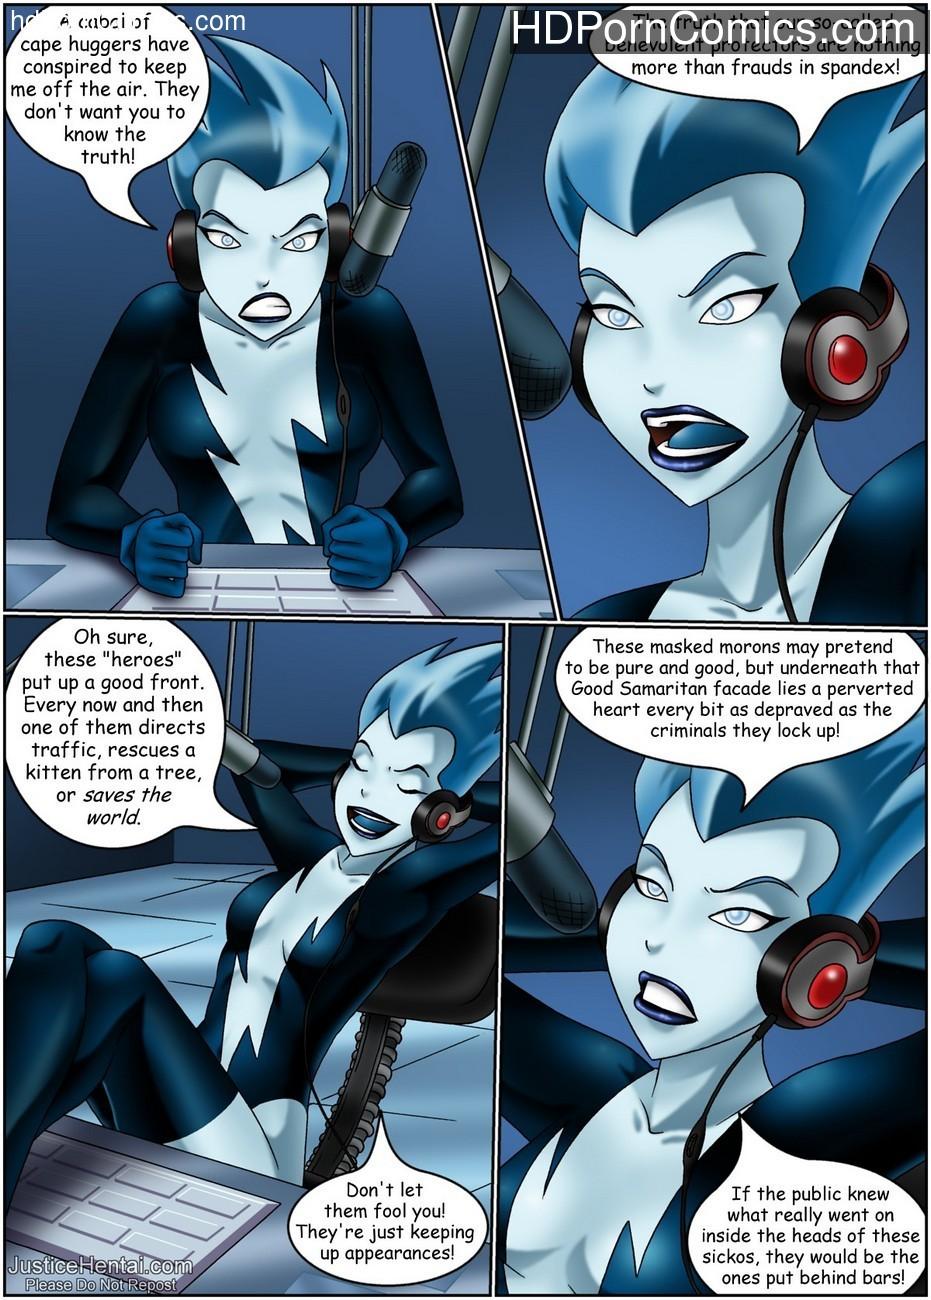 Justice Hentai 4 11 free sex comic